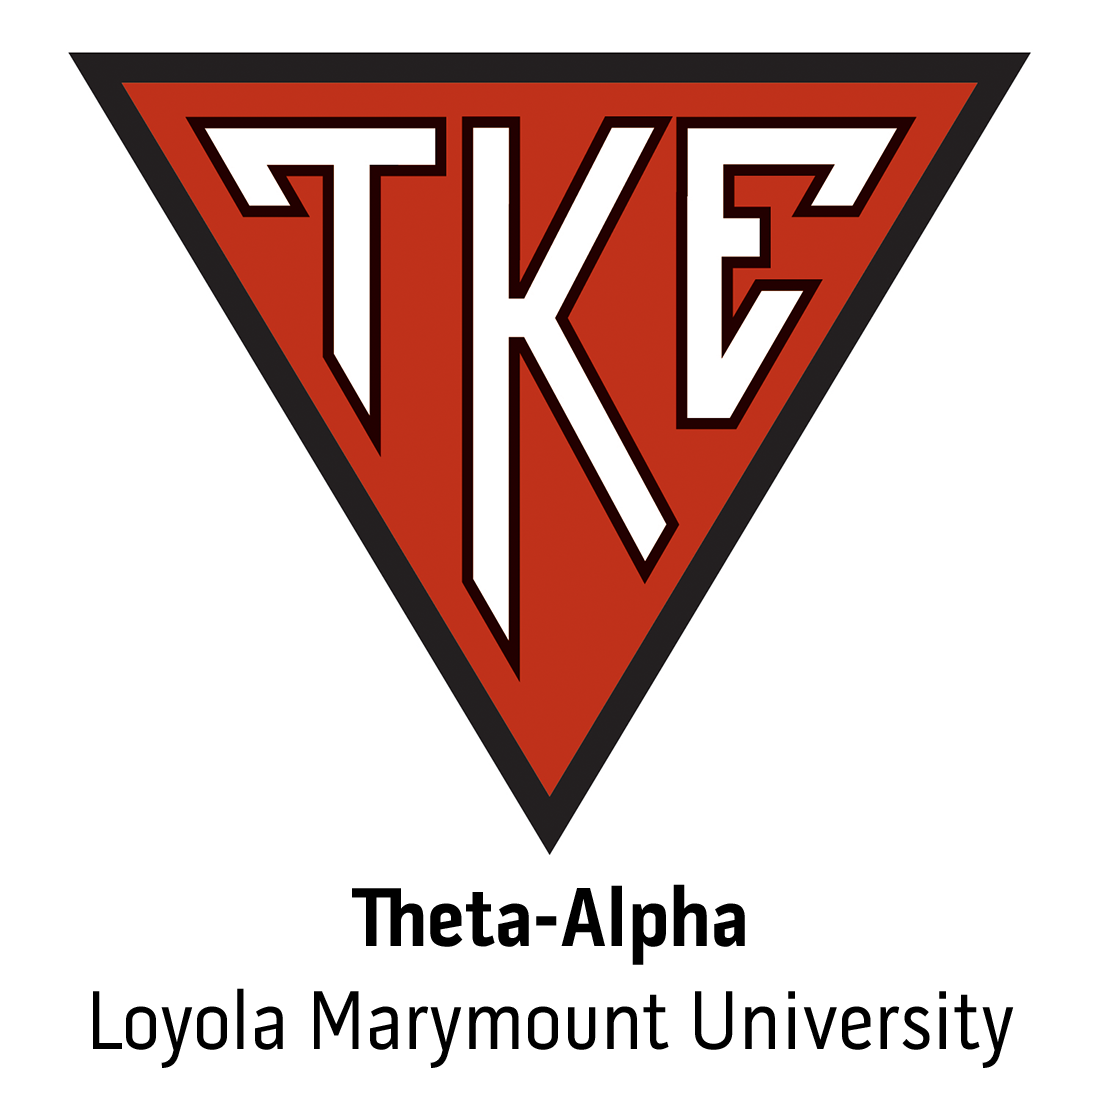 Theta-Alpha Chapter at Loyola Marymount University